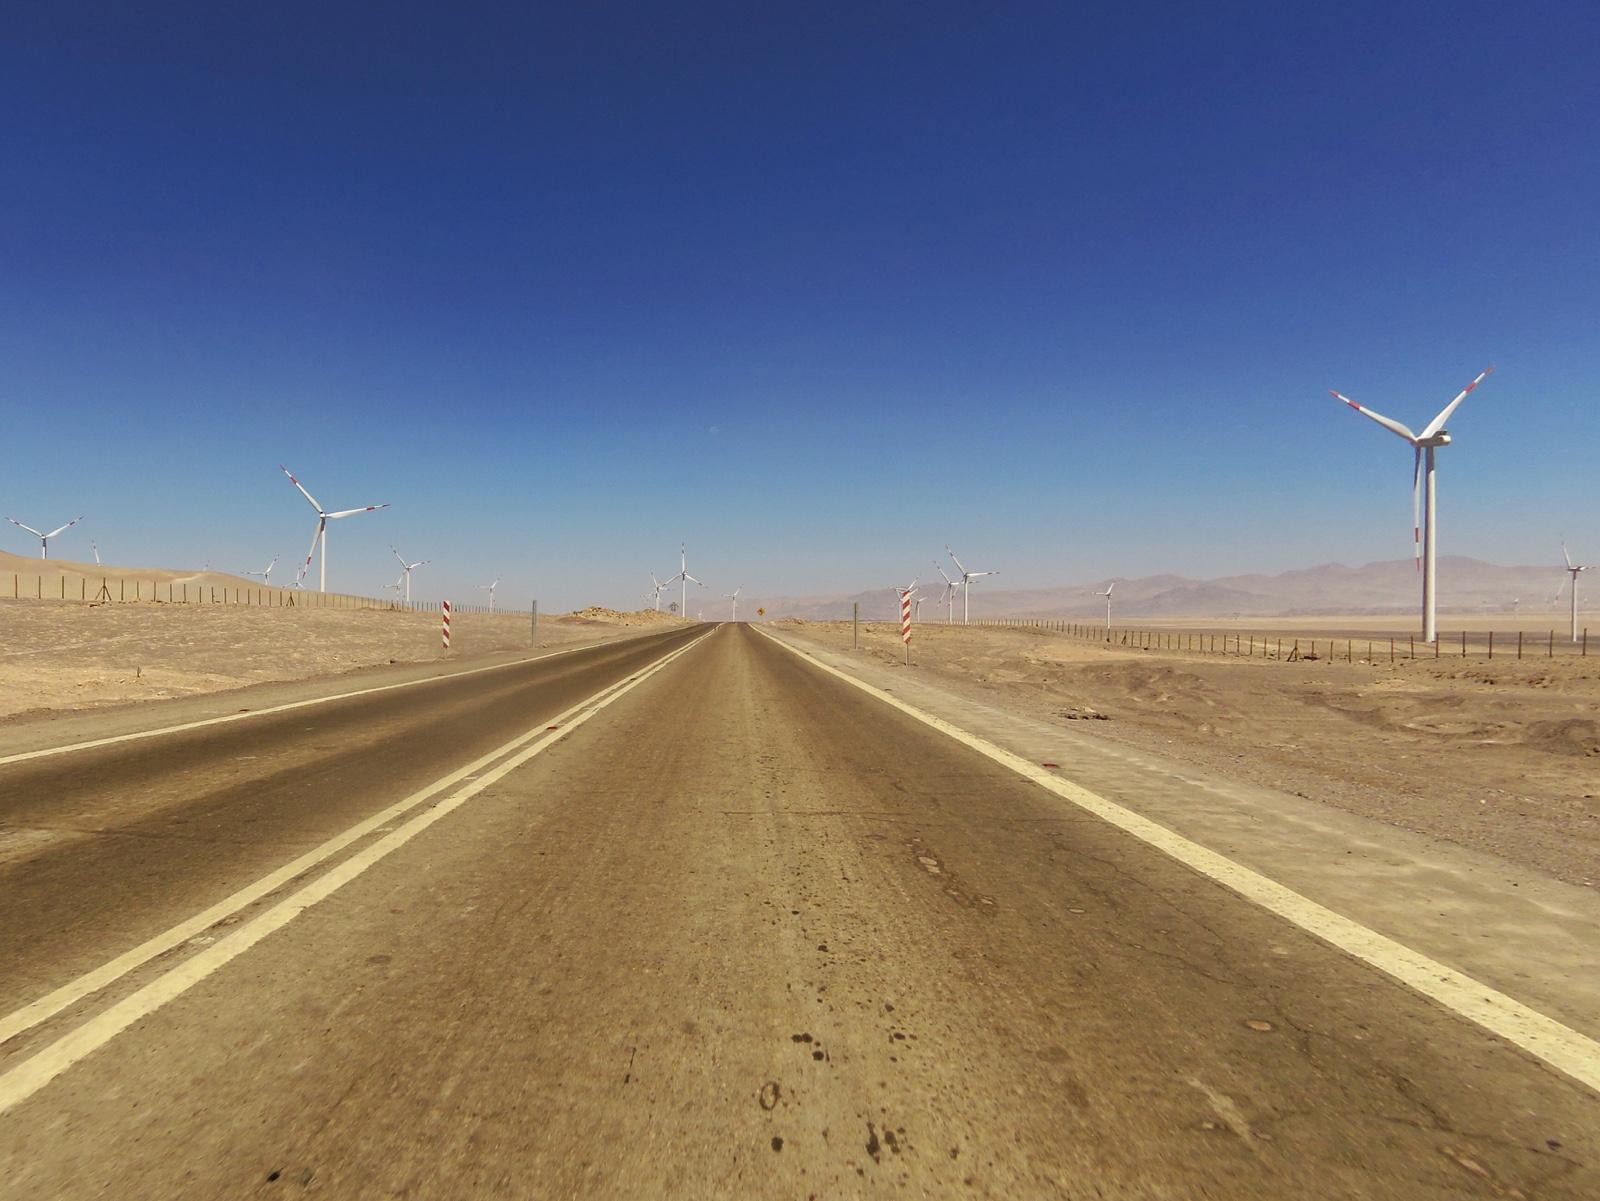 Windräder am Strassenrand